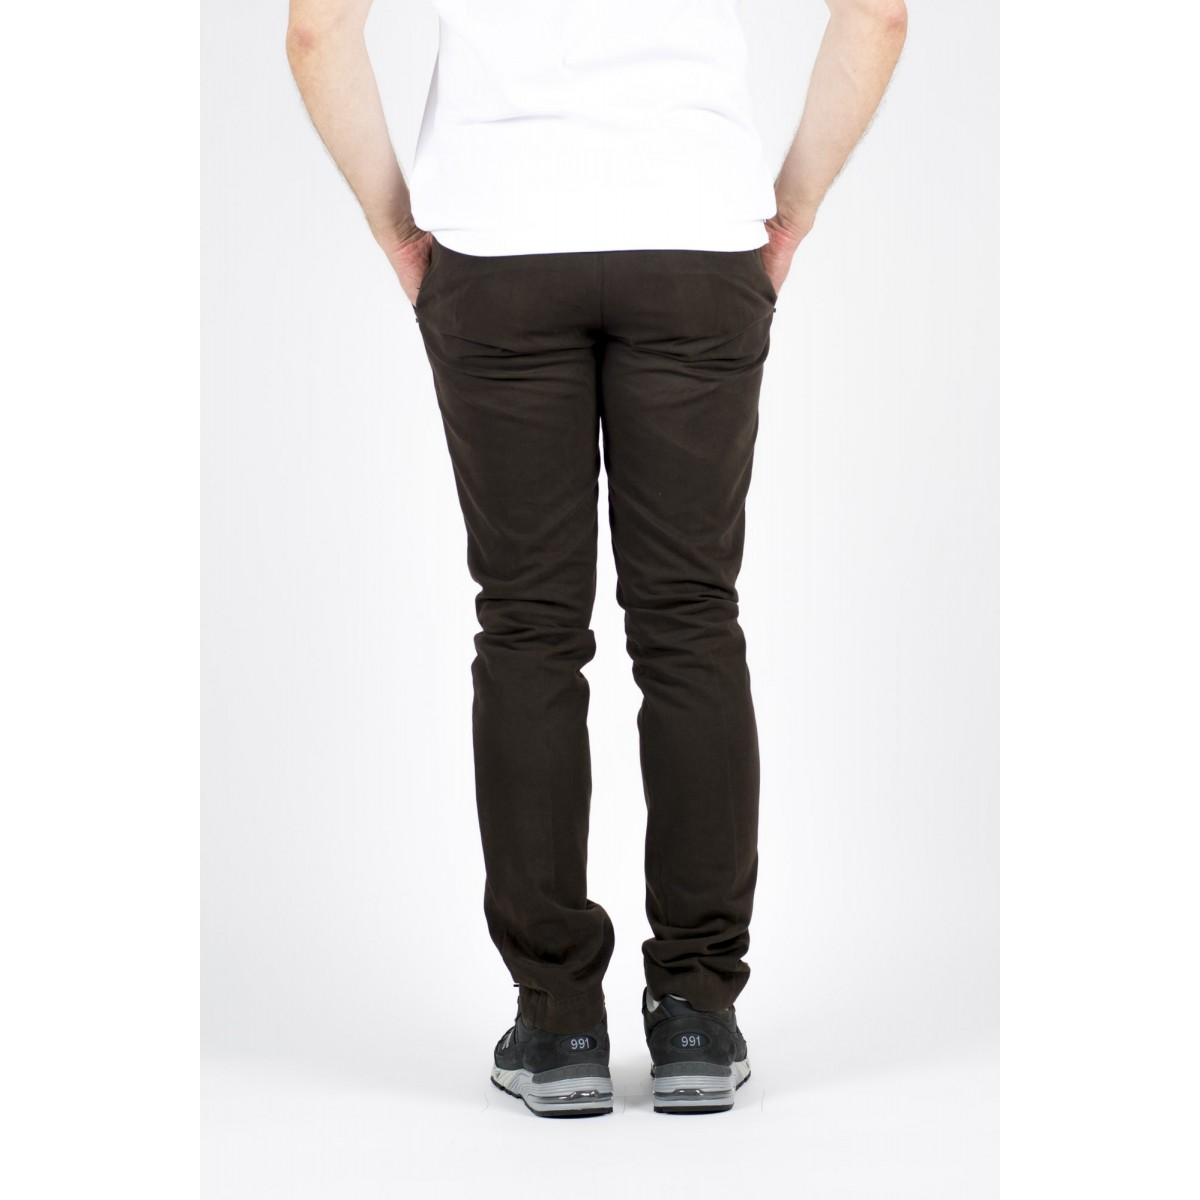 Trousers Entre Amis Man - A15 8201 502 - Tasta di moro